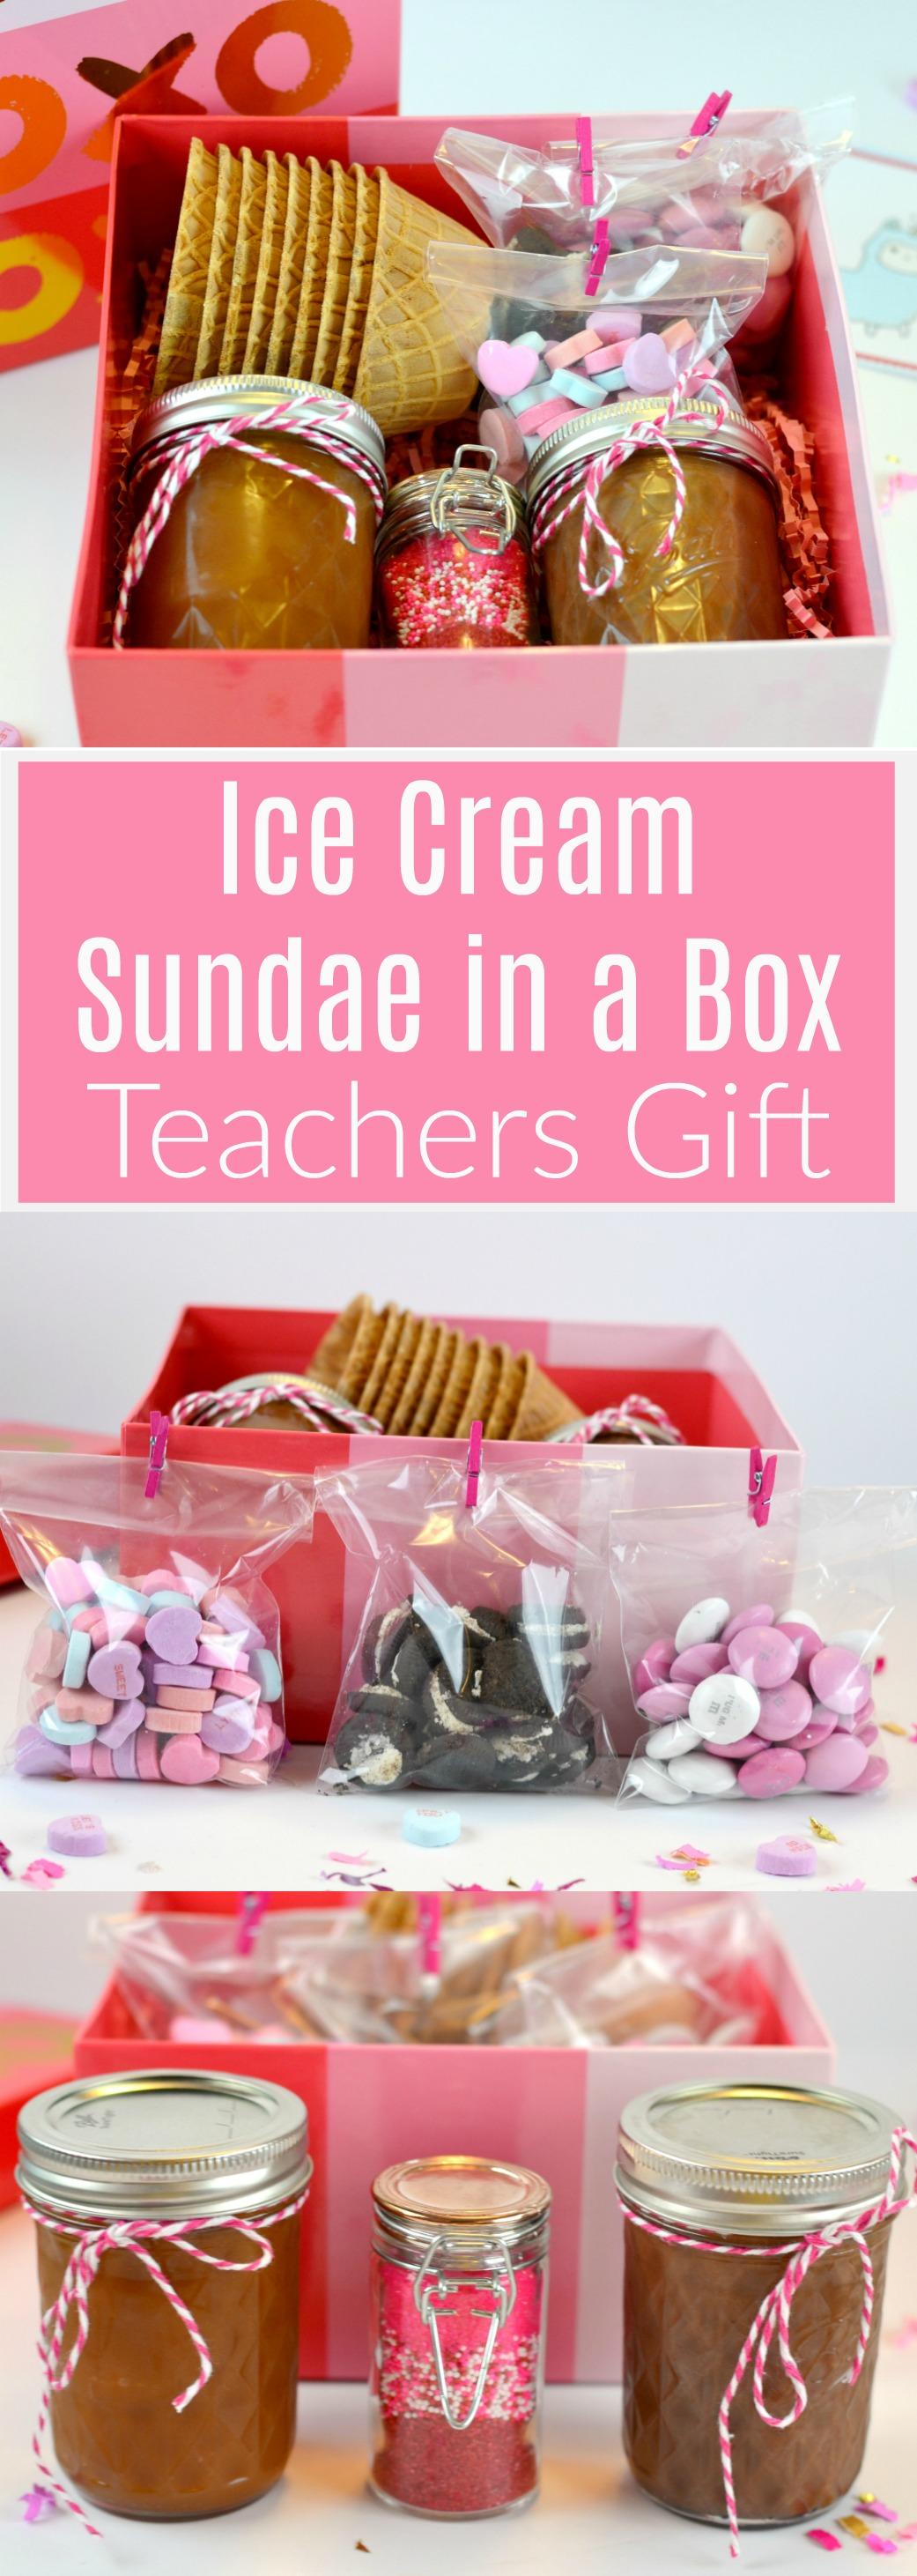 Ice Cream Sundae in a Box Teachers Gift